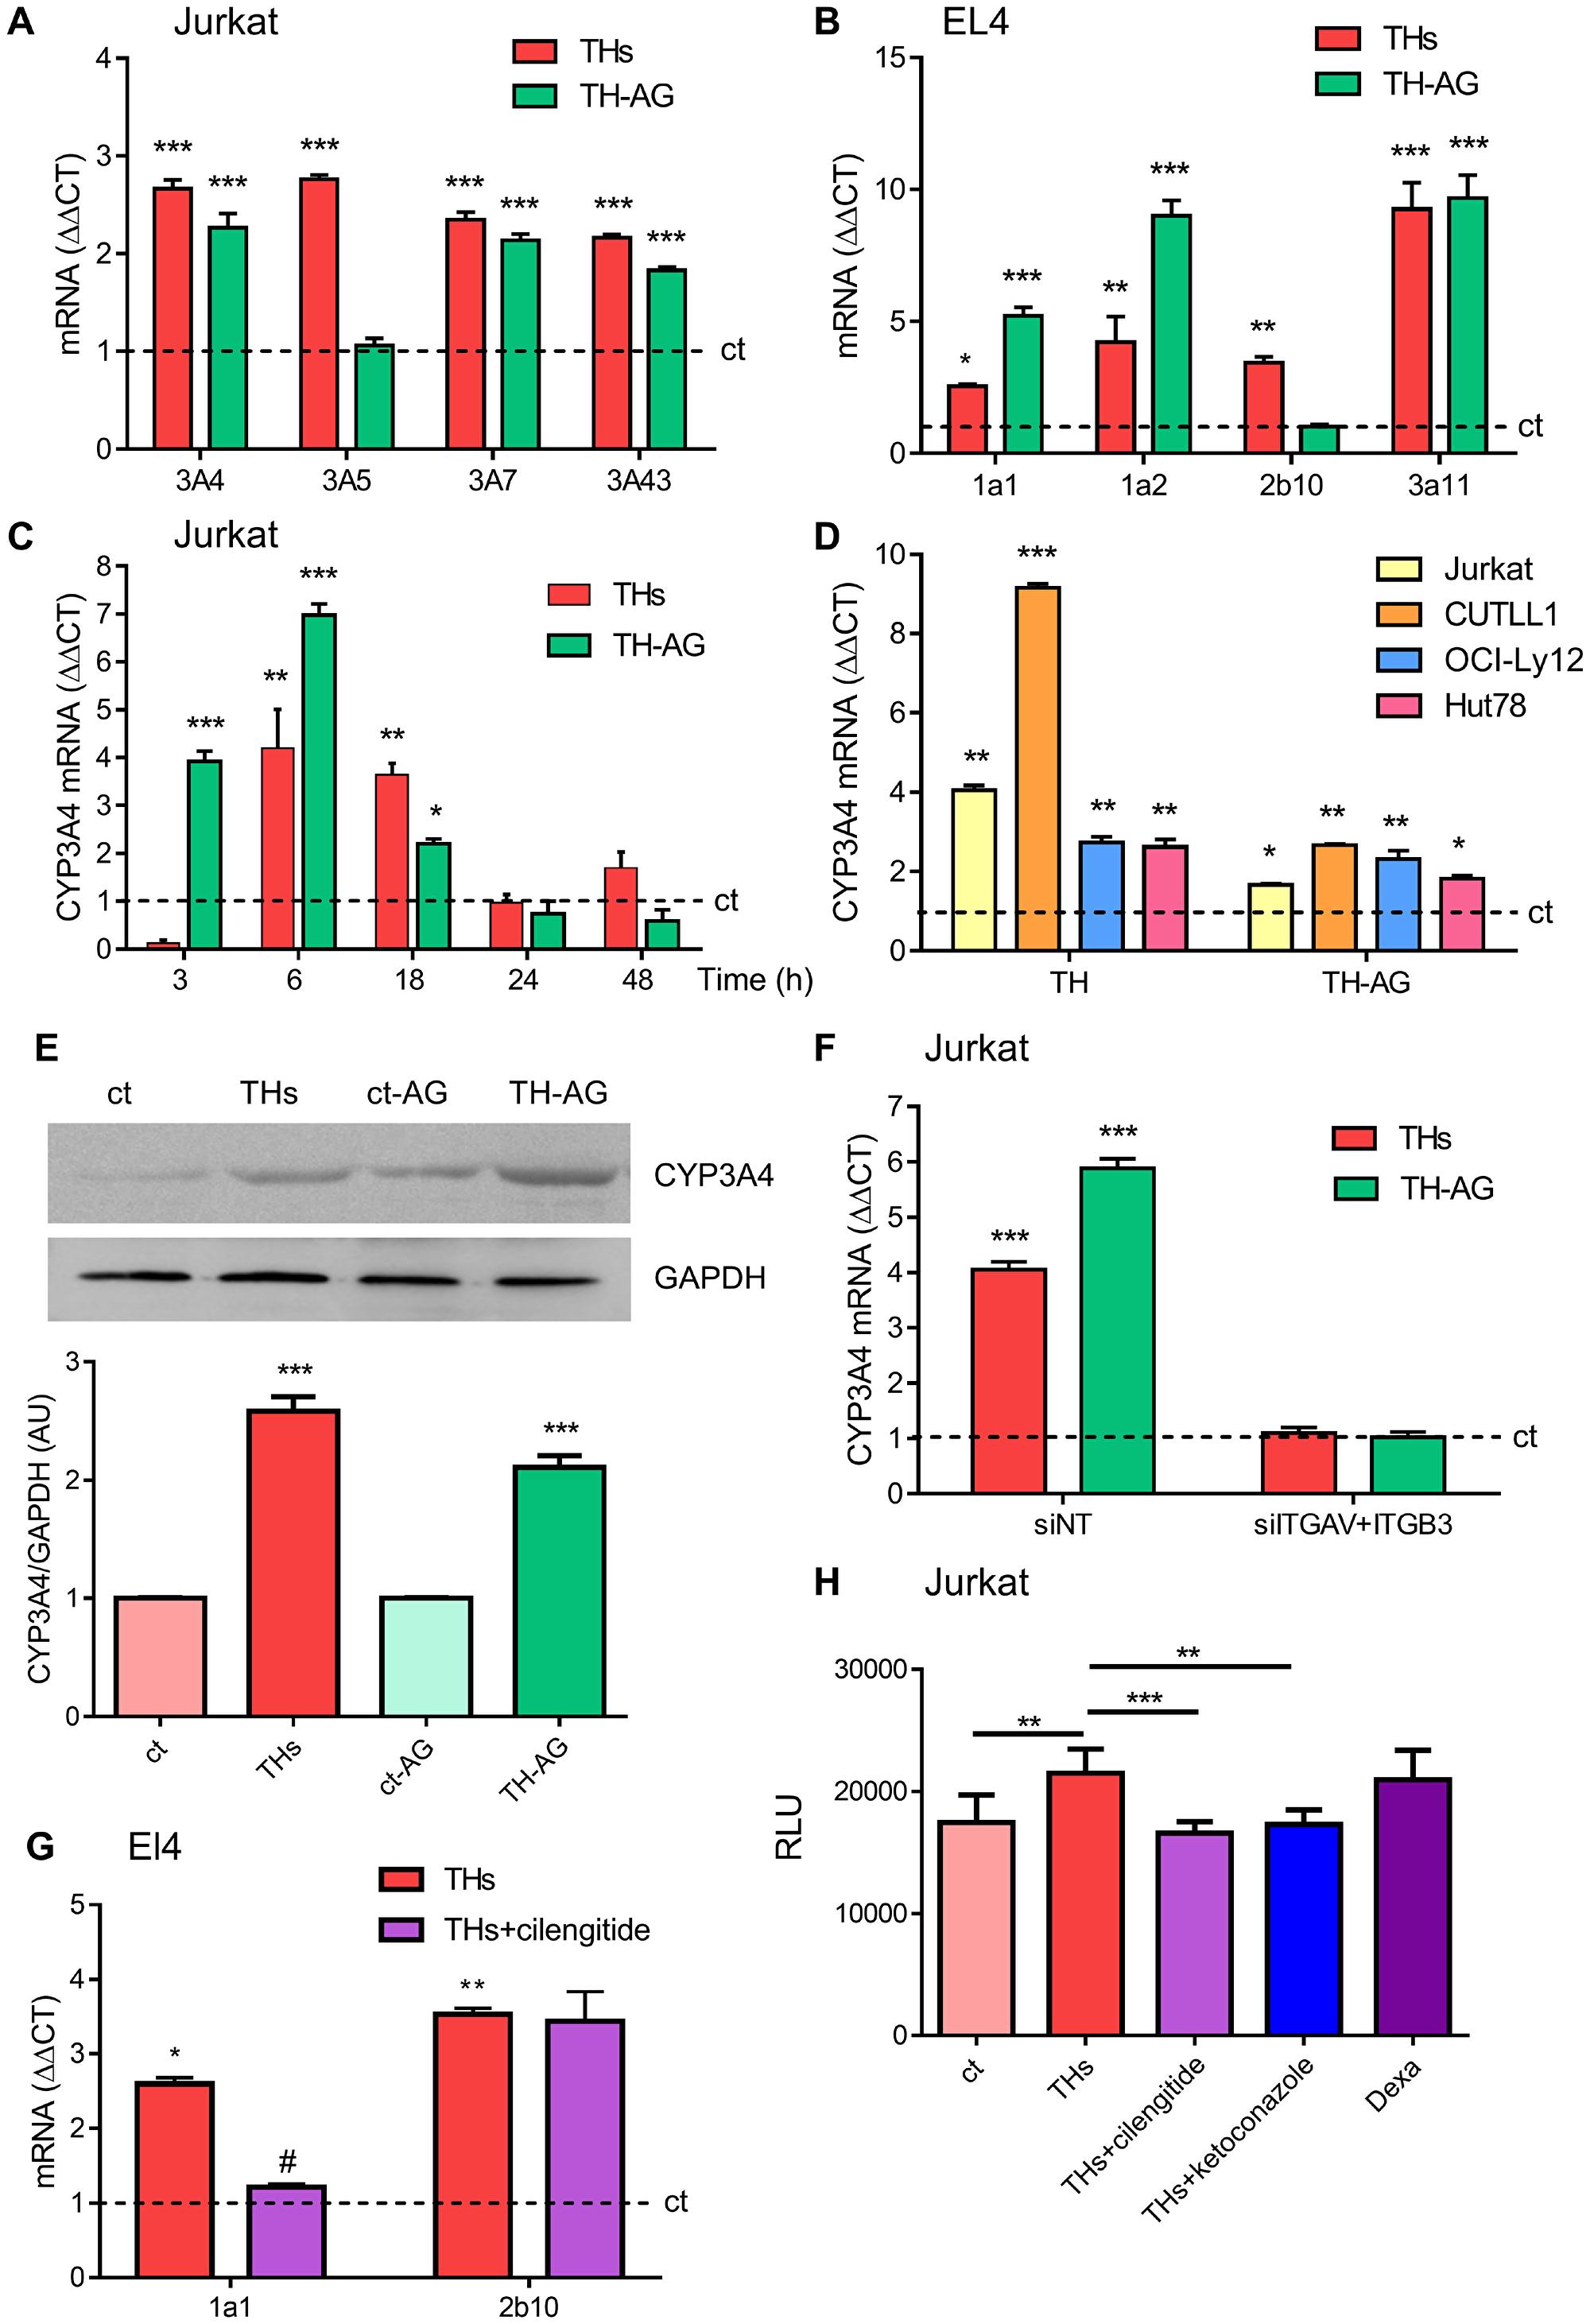 Thyroid hormones modulation of CYP P450 levels.